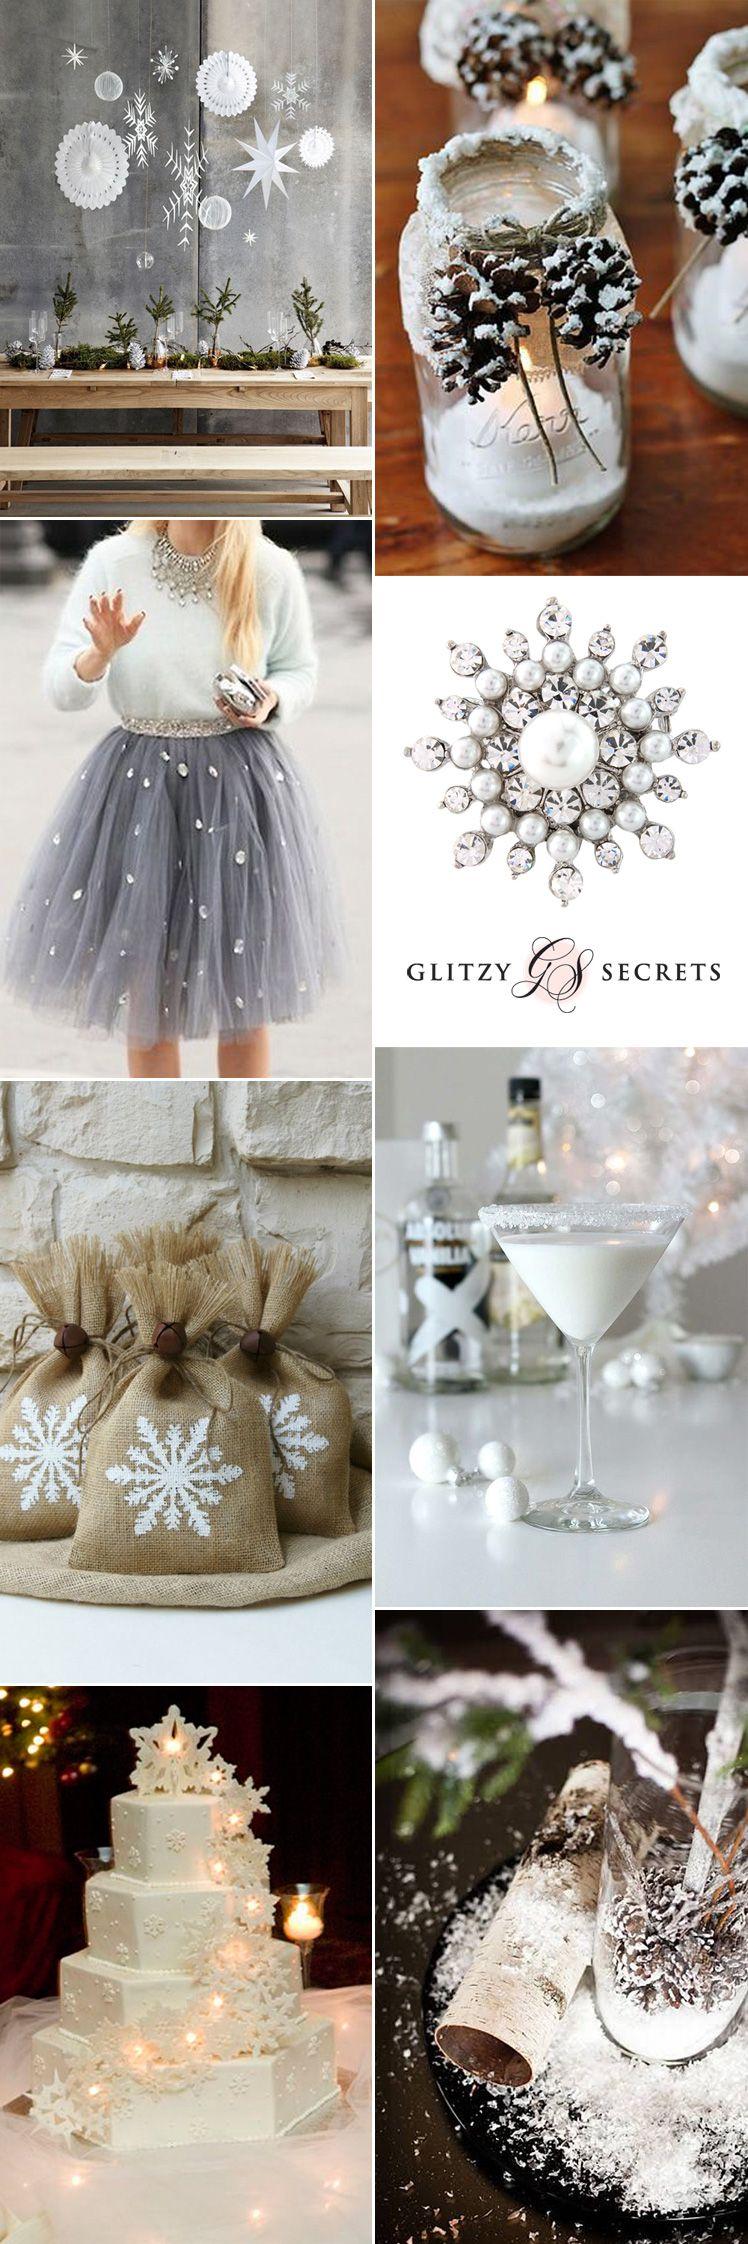 Magical Snowflake Wedding Theme Inspiration   Snowy wedding ...